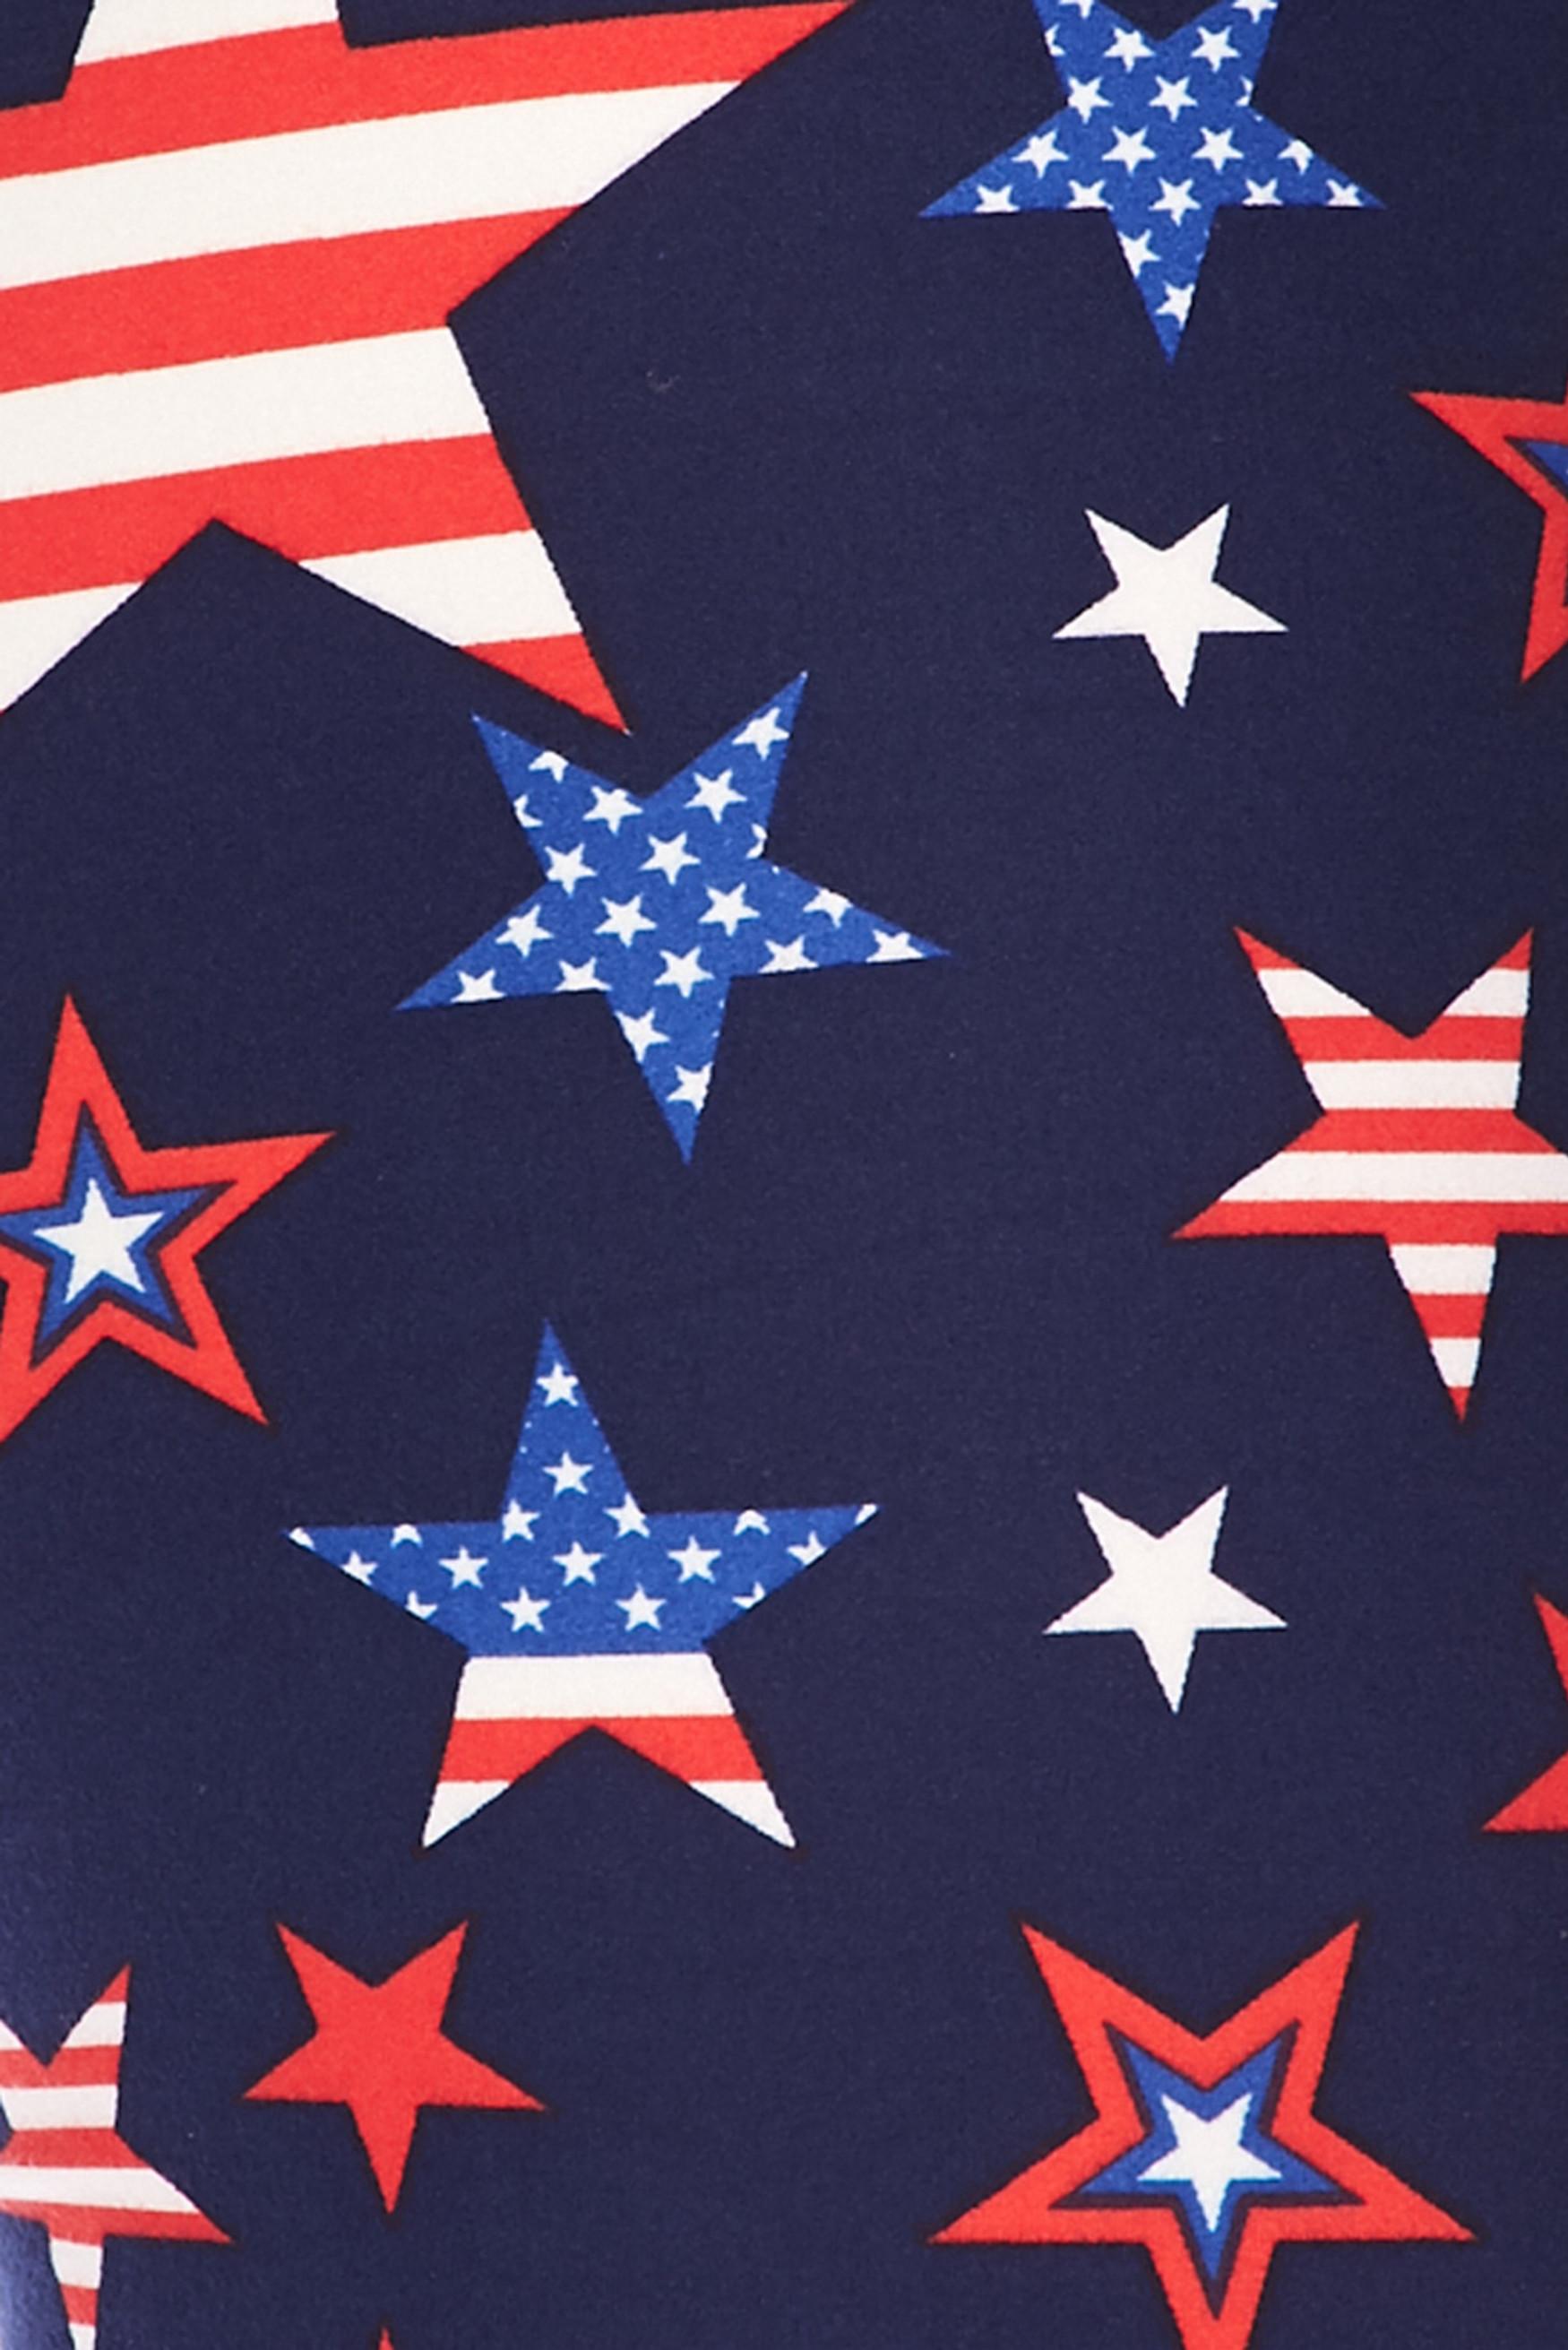 Buttery Soft USA Stars Plus Size Leggings